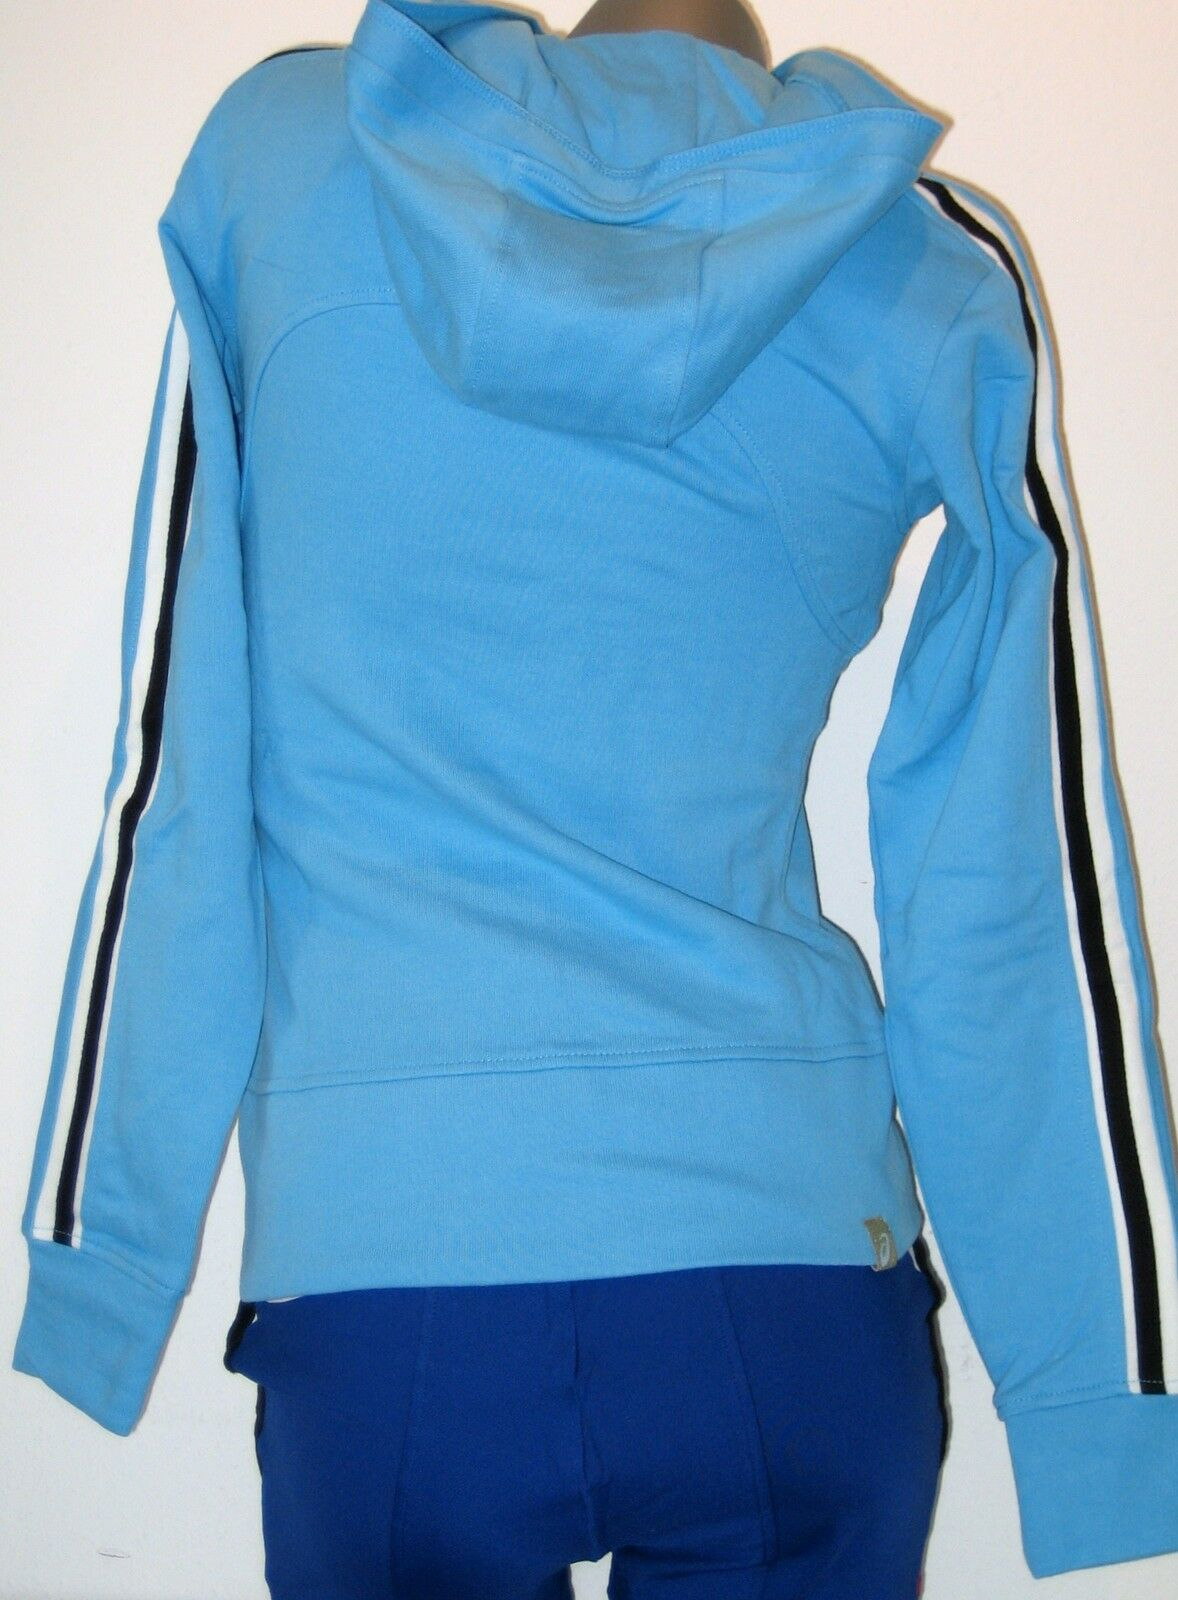 ASICS Damen Hoodie Sweat Größe XS ( 32 / 34 ) blau NEU JACKET PERU